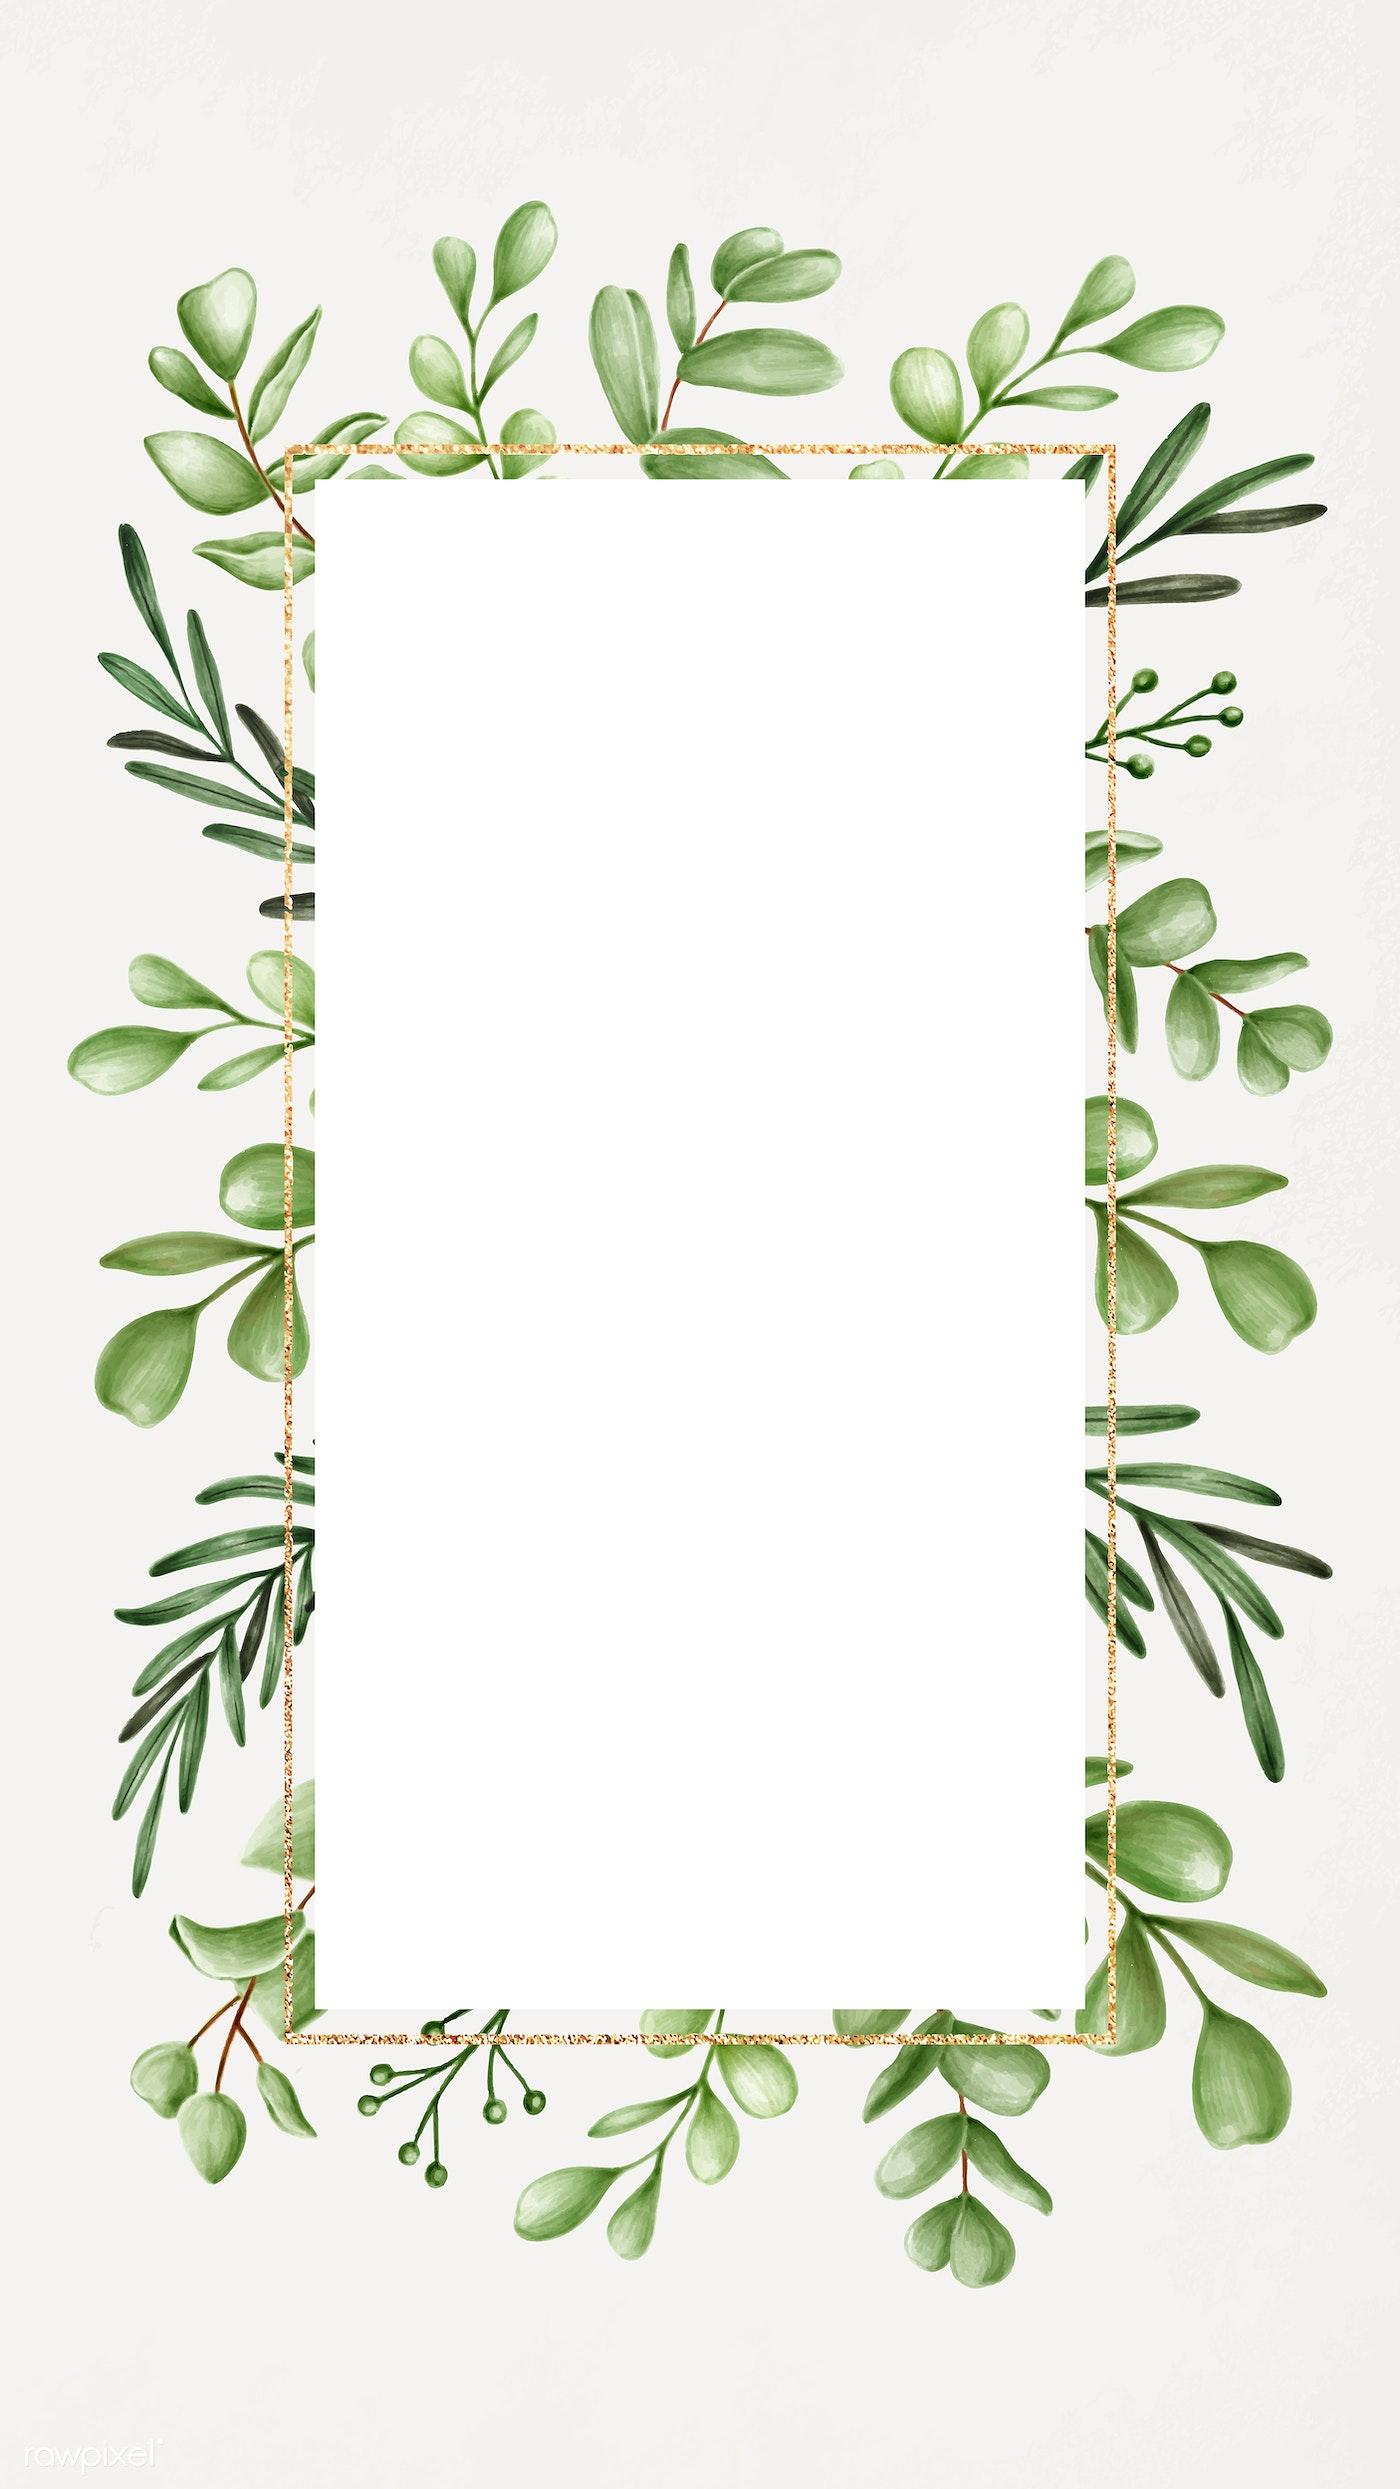 Botanical Patterned Mobile Wallpaper Royalty Free Vector 2032822